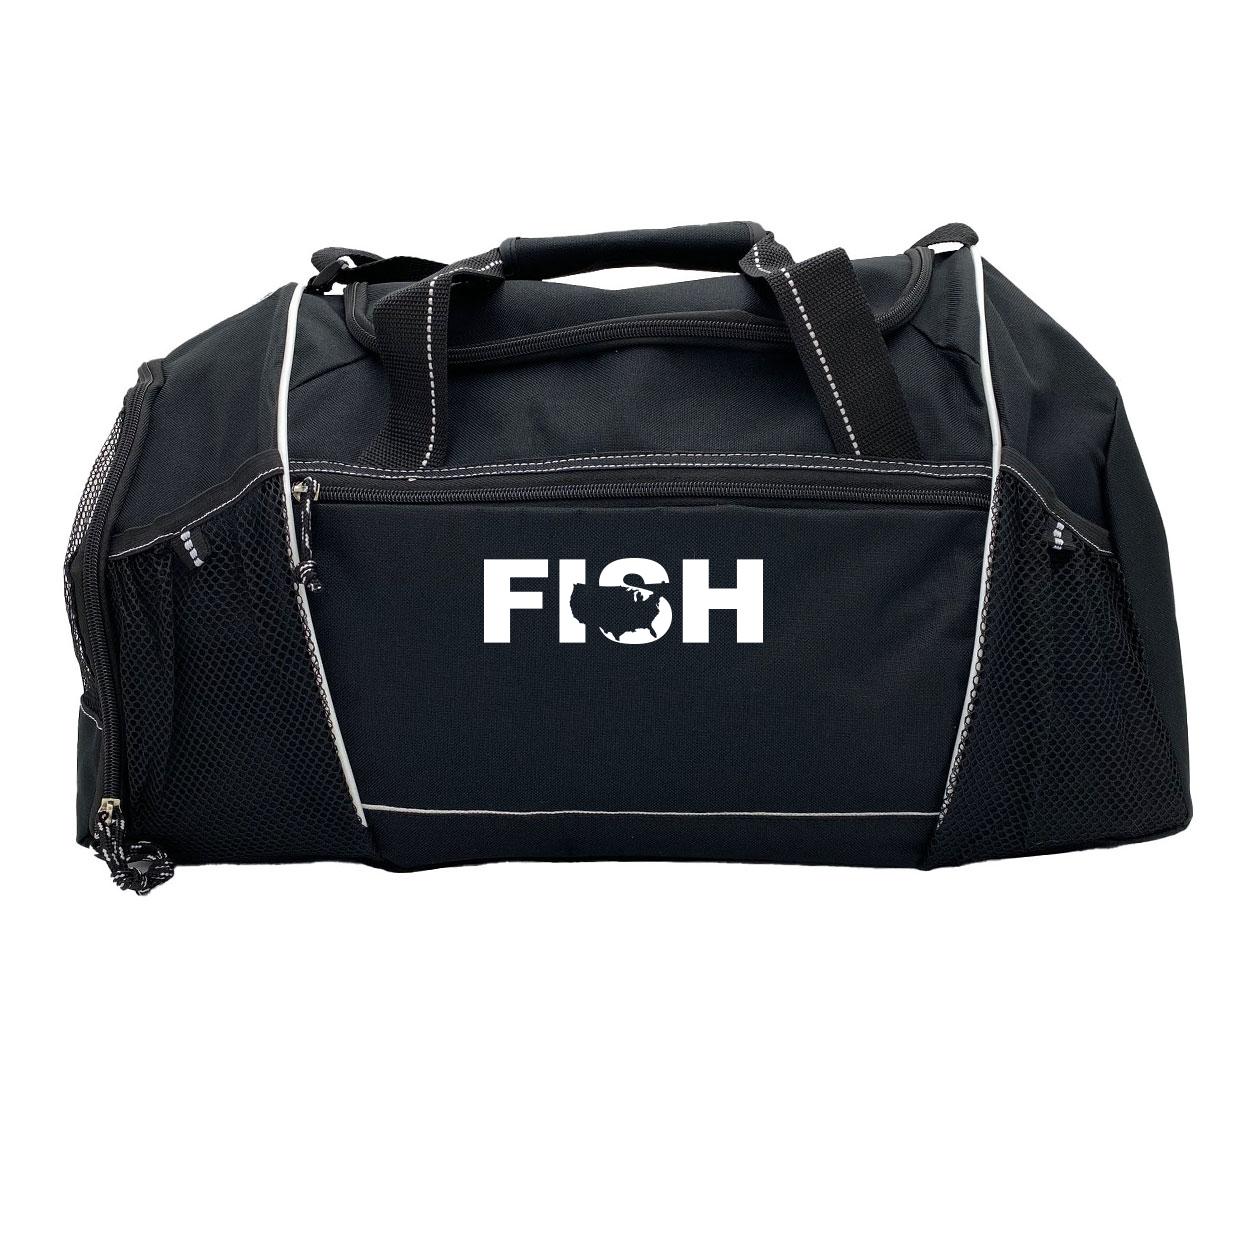 Fish United States Classic Endurance Sport Duffel Bag Black (White Logo)